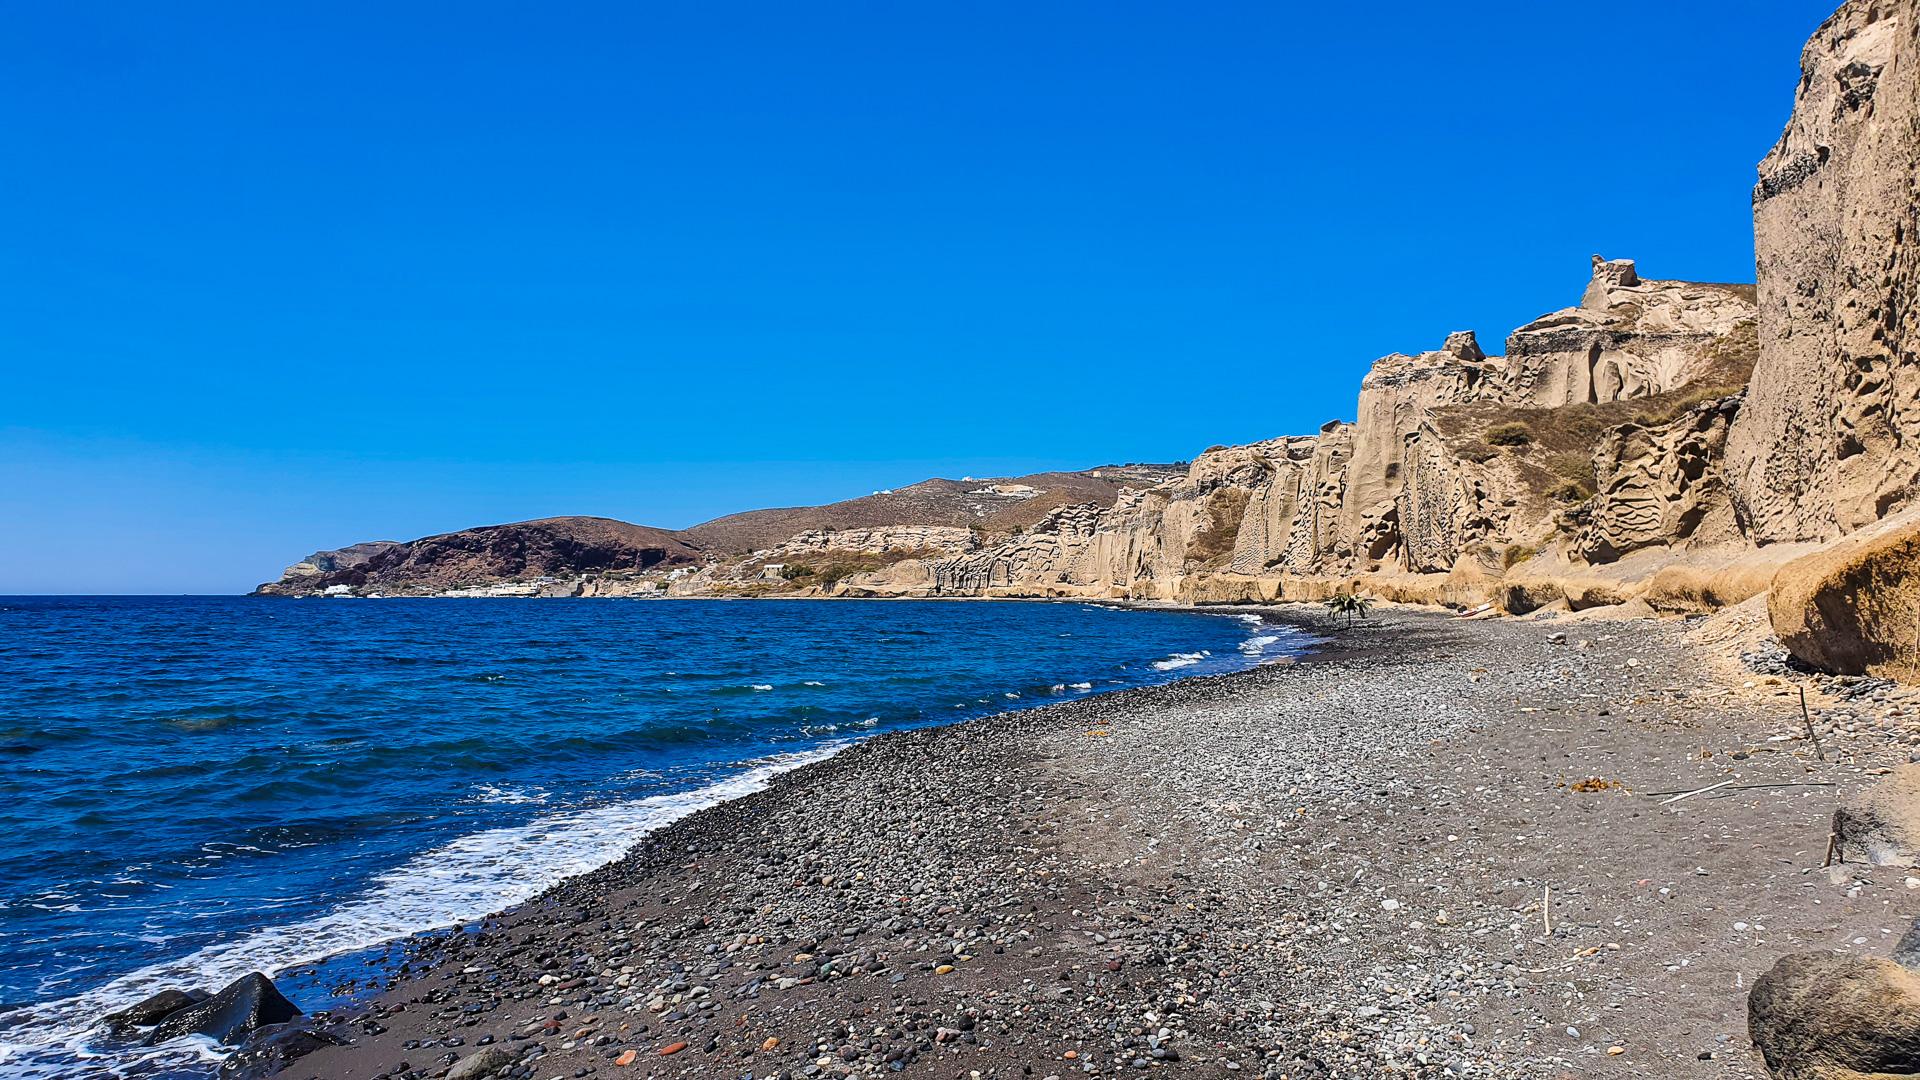 Almyra Beach view to the West